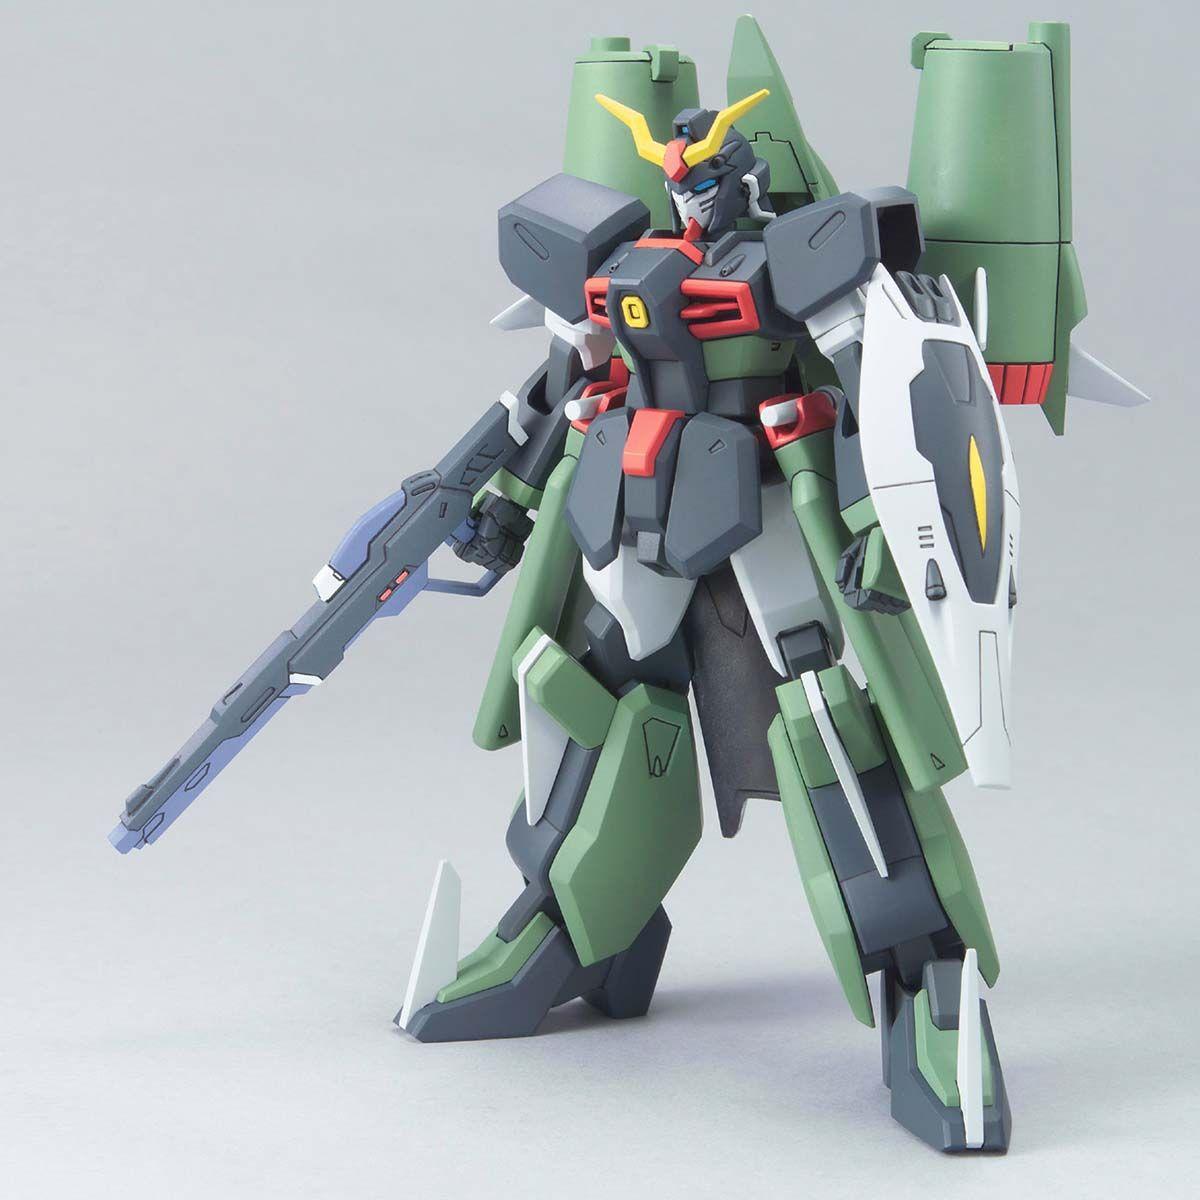 1466HG 1/144 ZGMF-X24S カオスガンダム [Chaos Gundam]